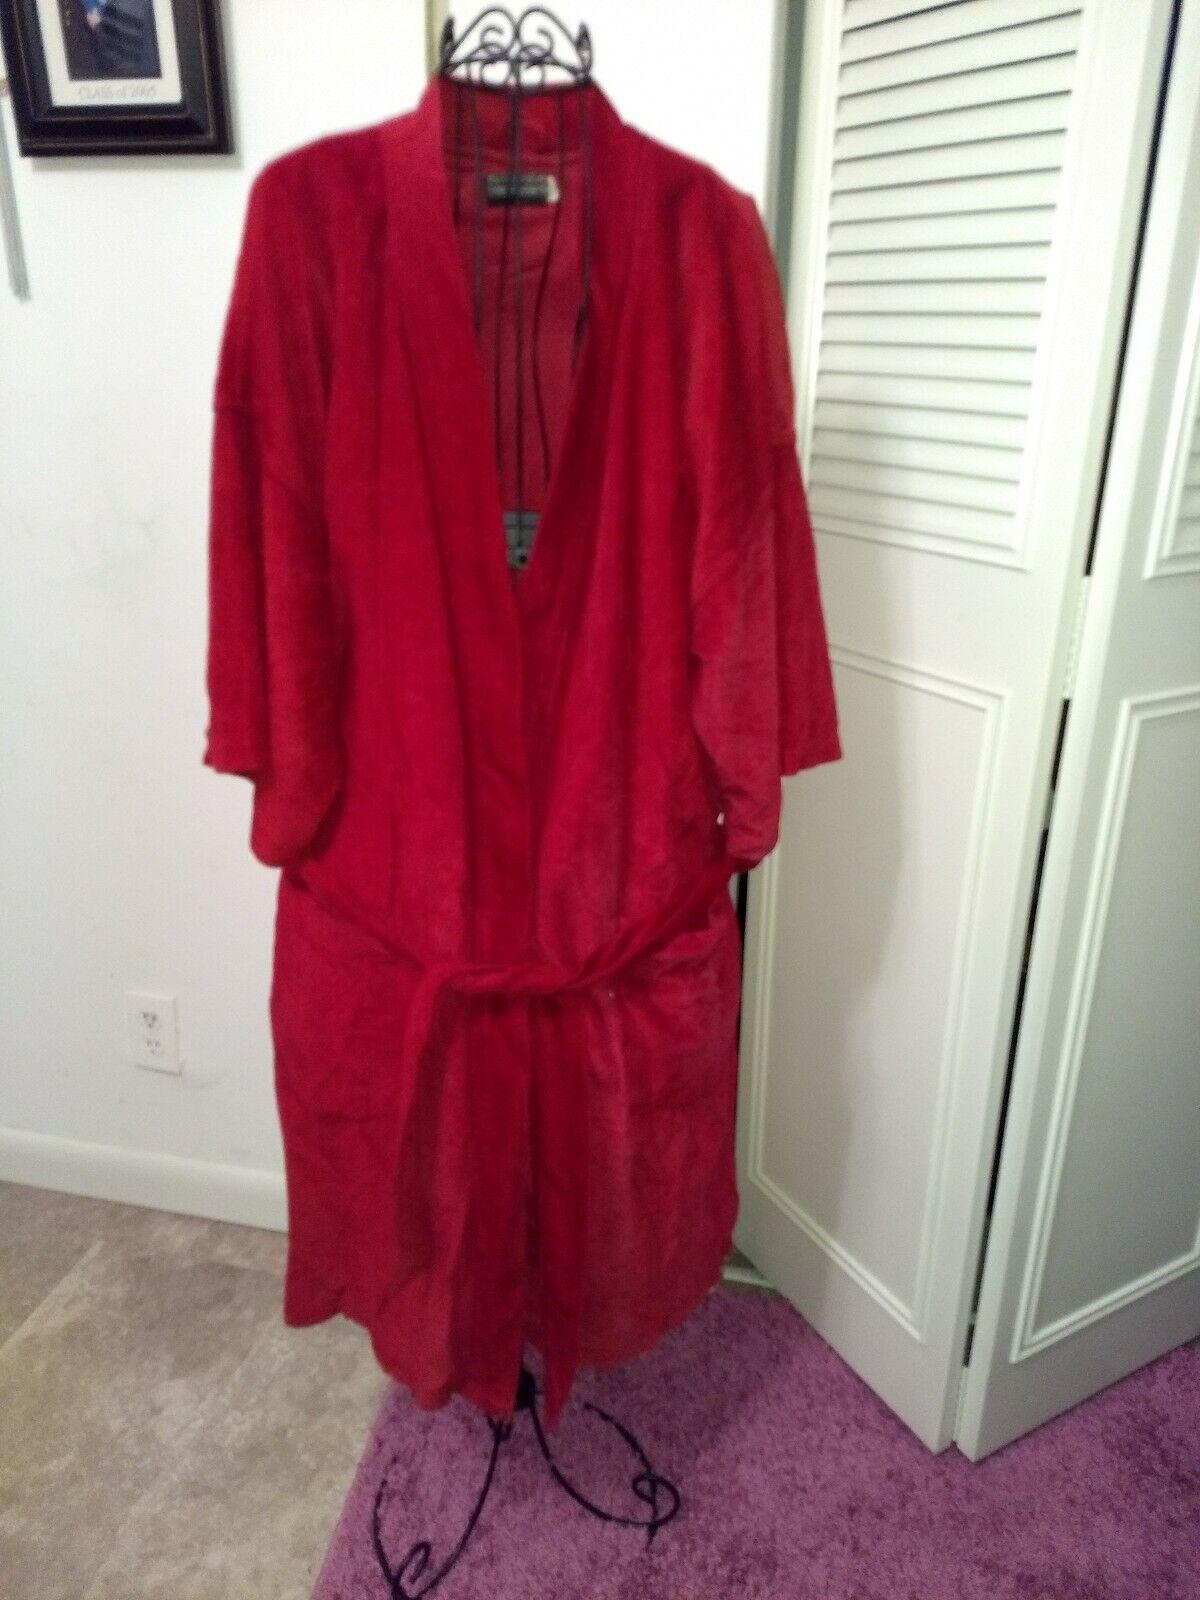 The herren store Bloomingdales. One Größe herren bath robe.